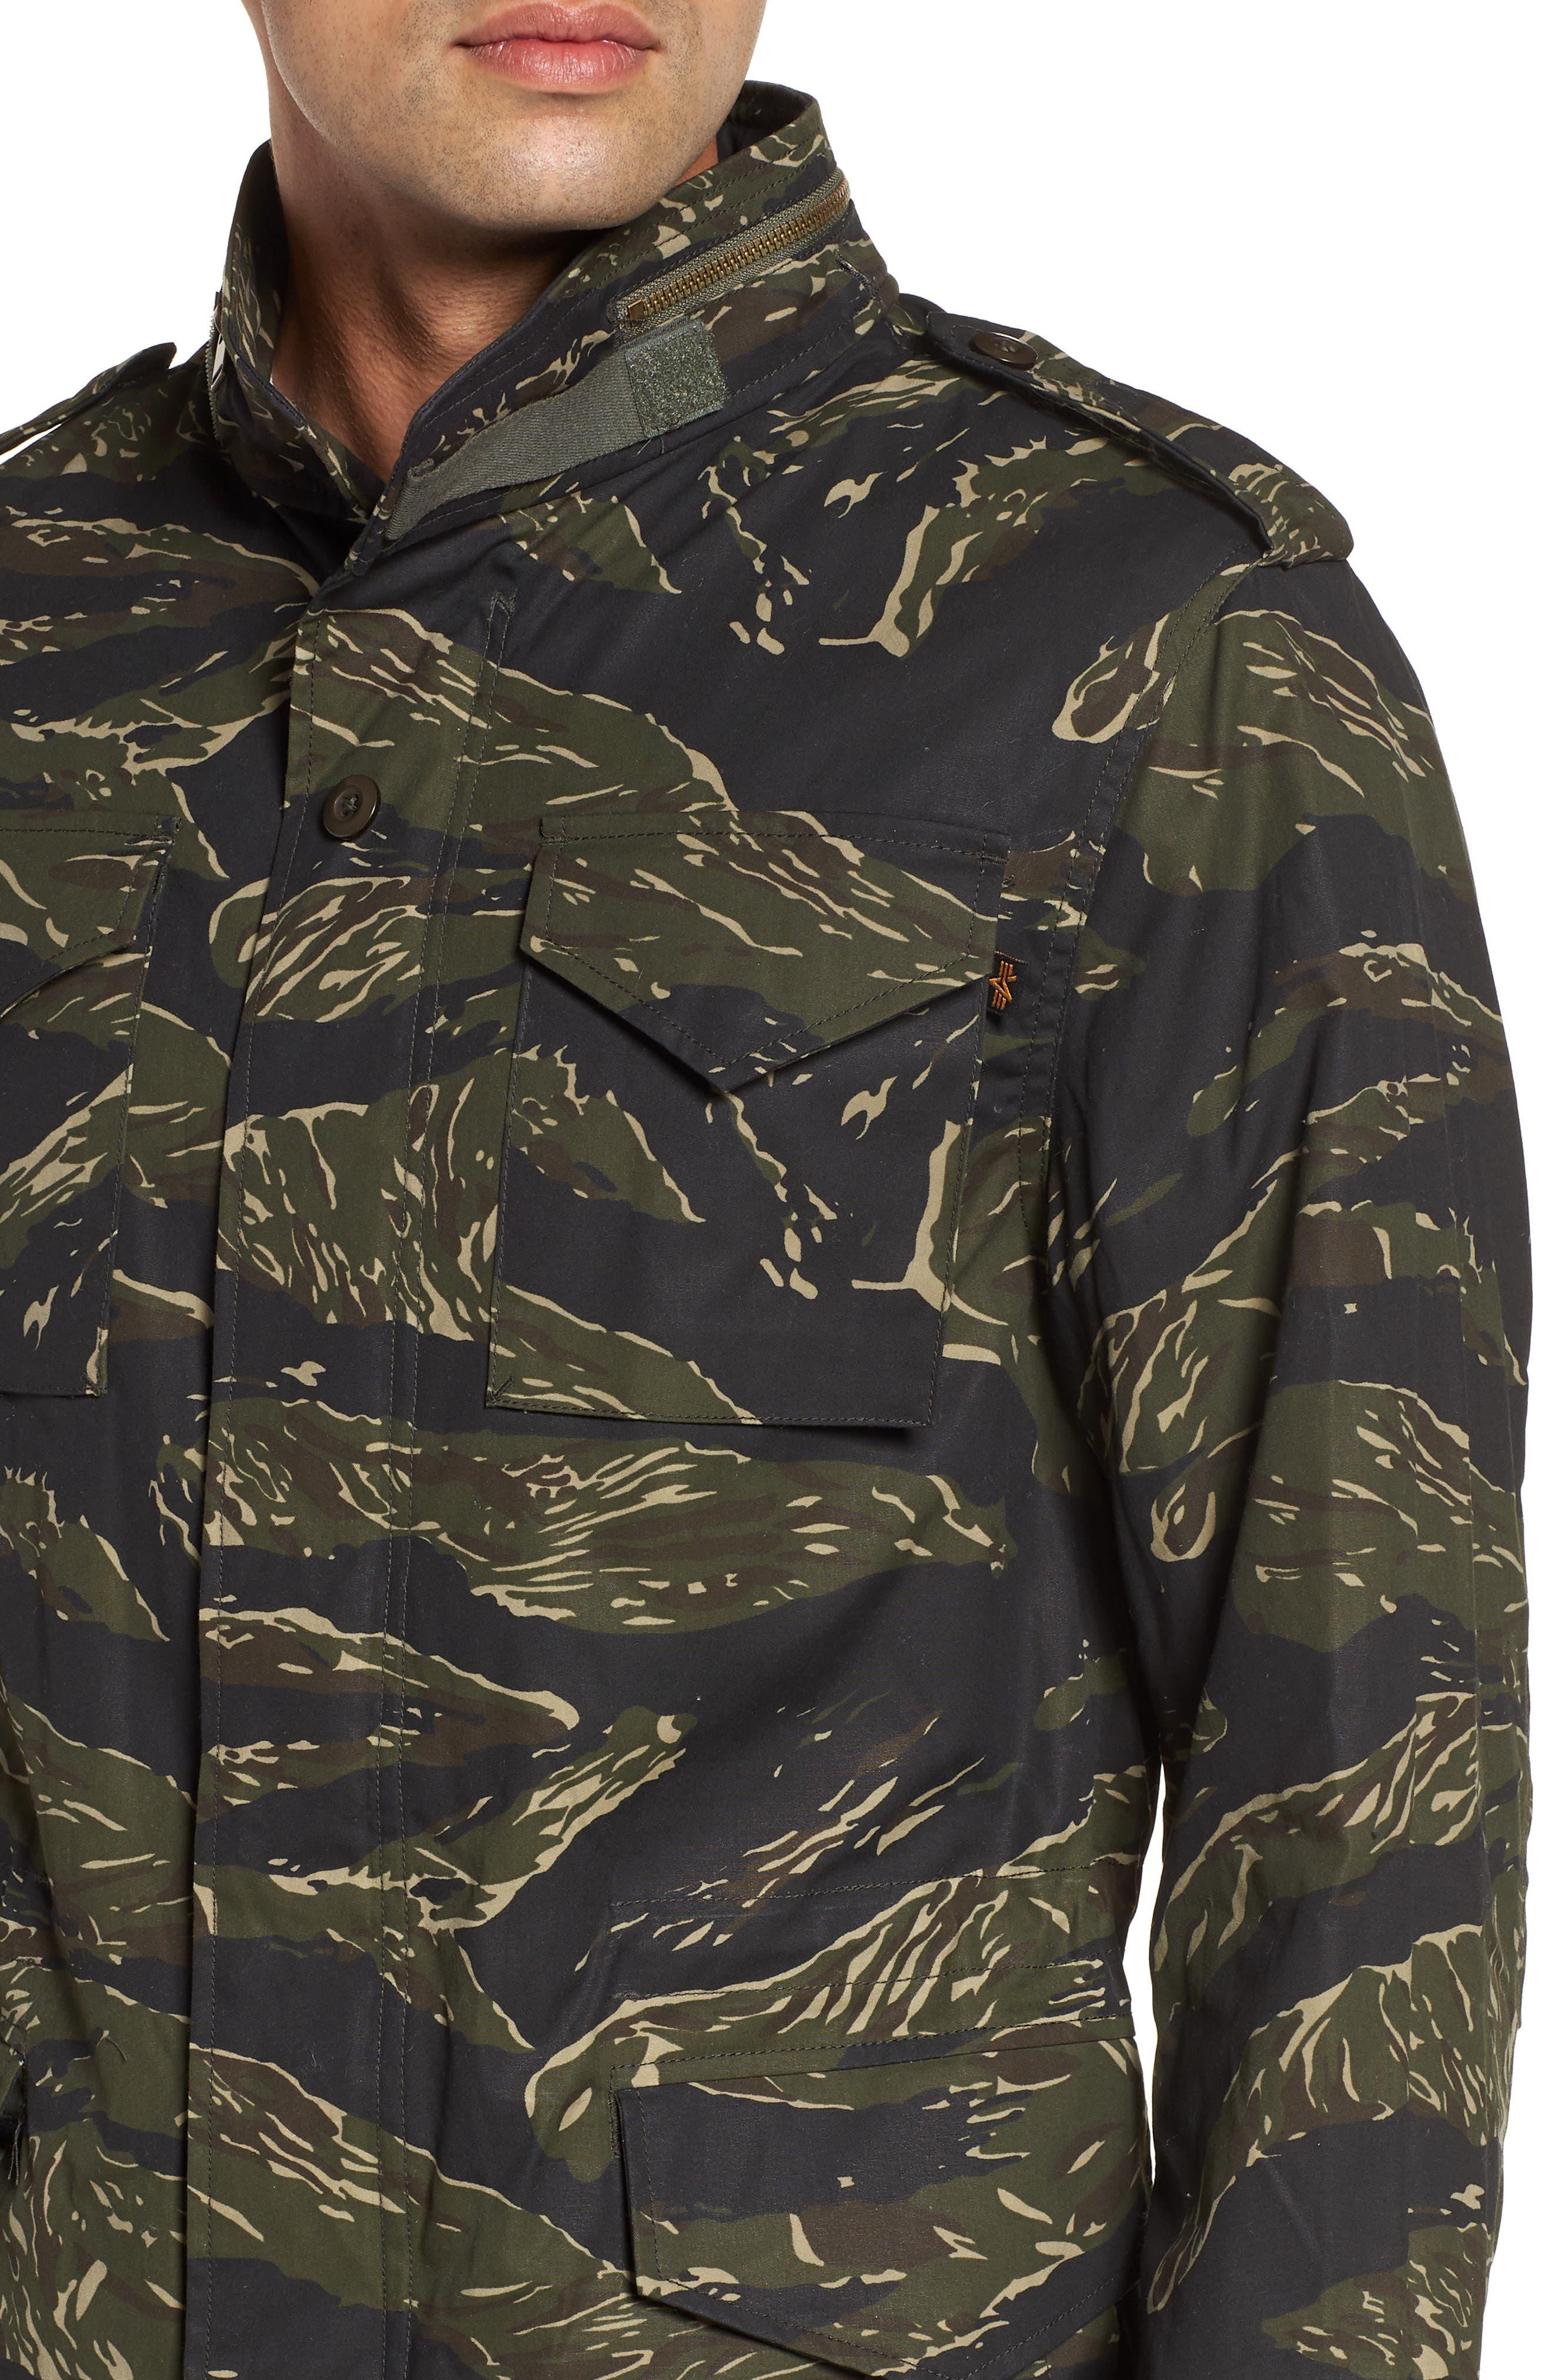 M-65 Defender Waxed Camo Field Jacket,                             Alternate thumbnail 4, color,                             TIGER CAMO